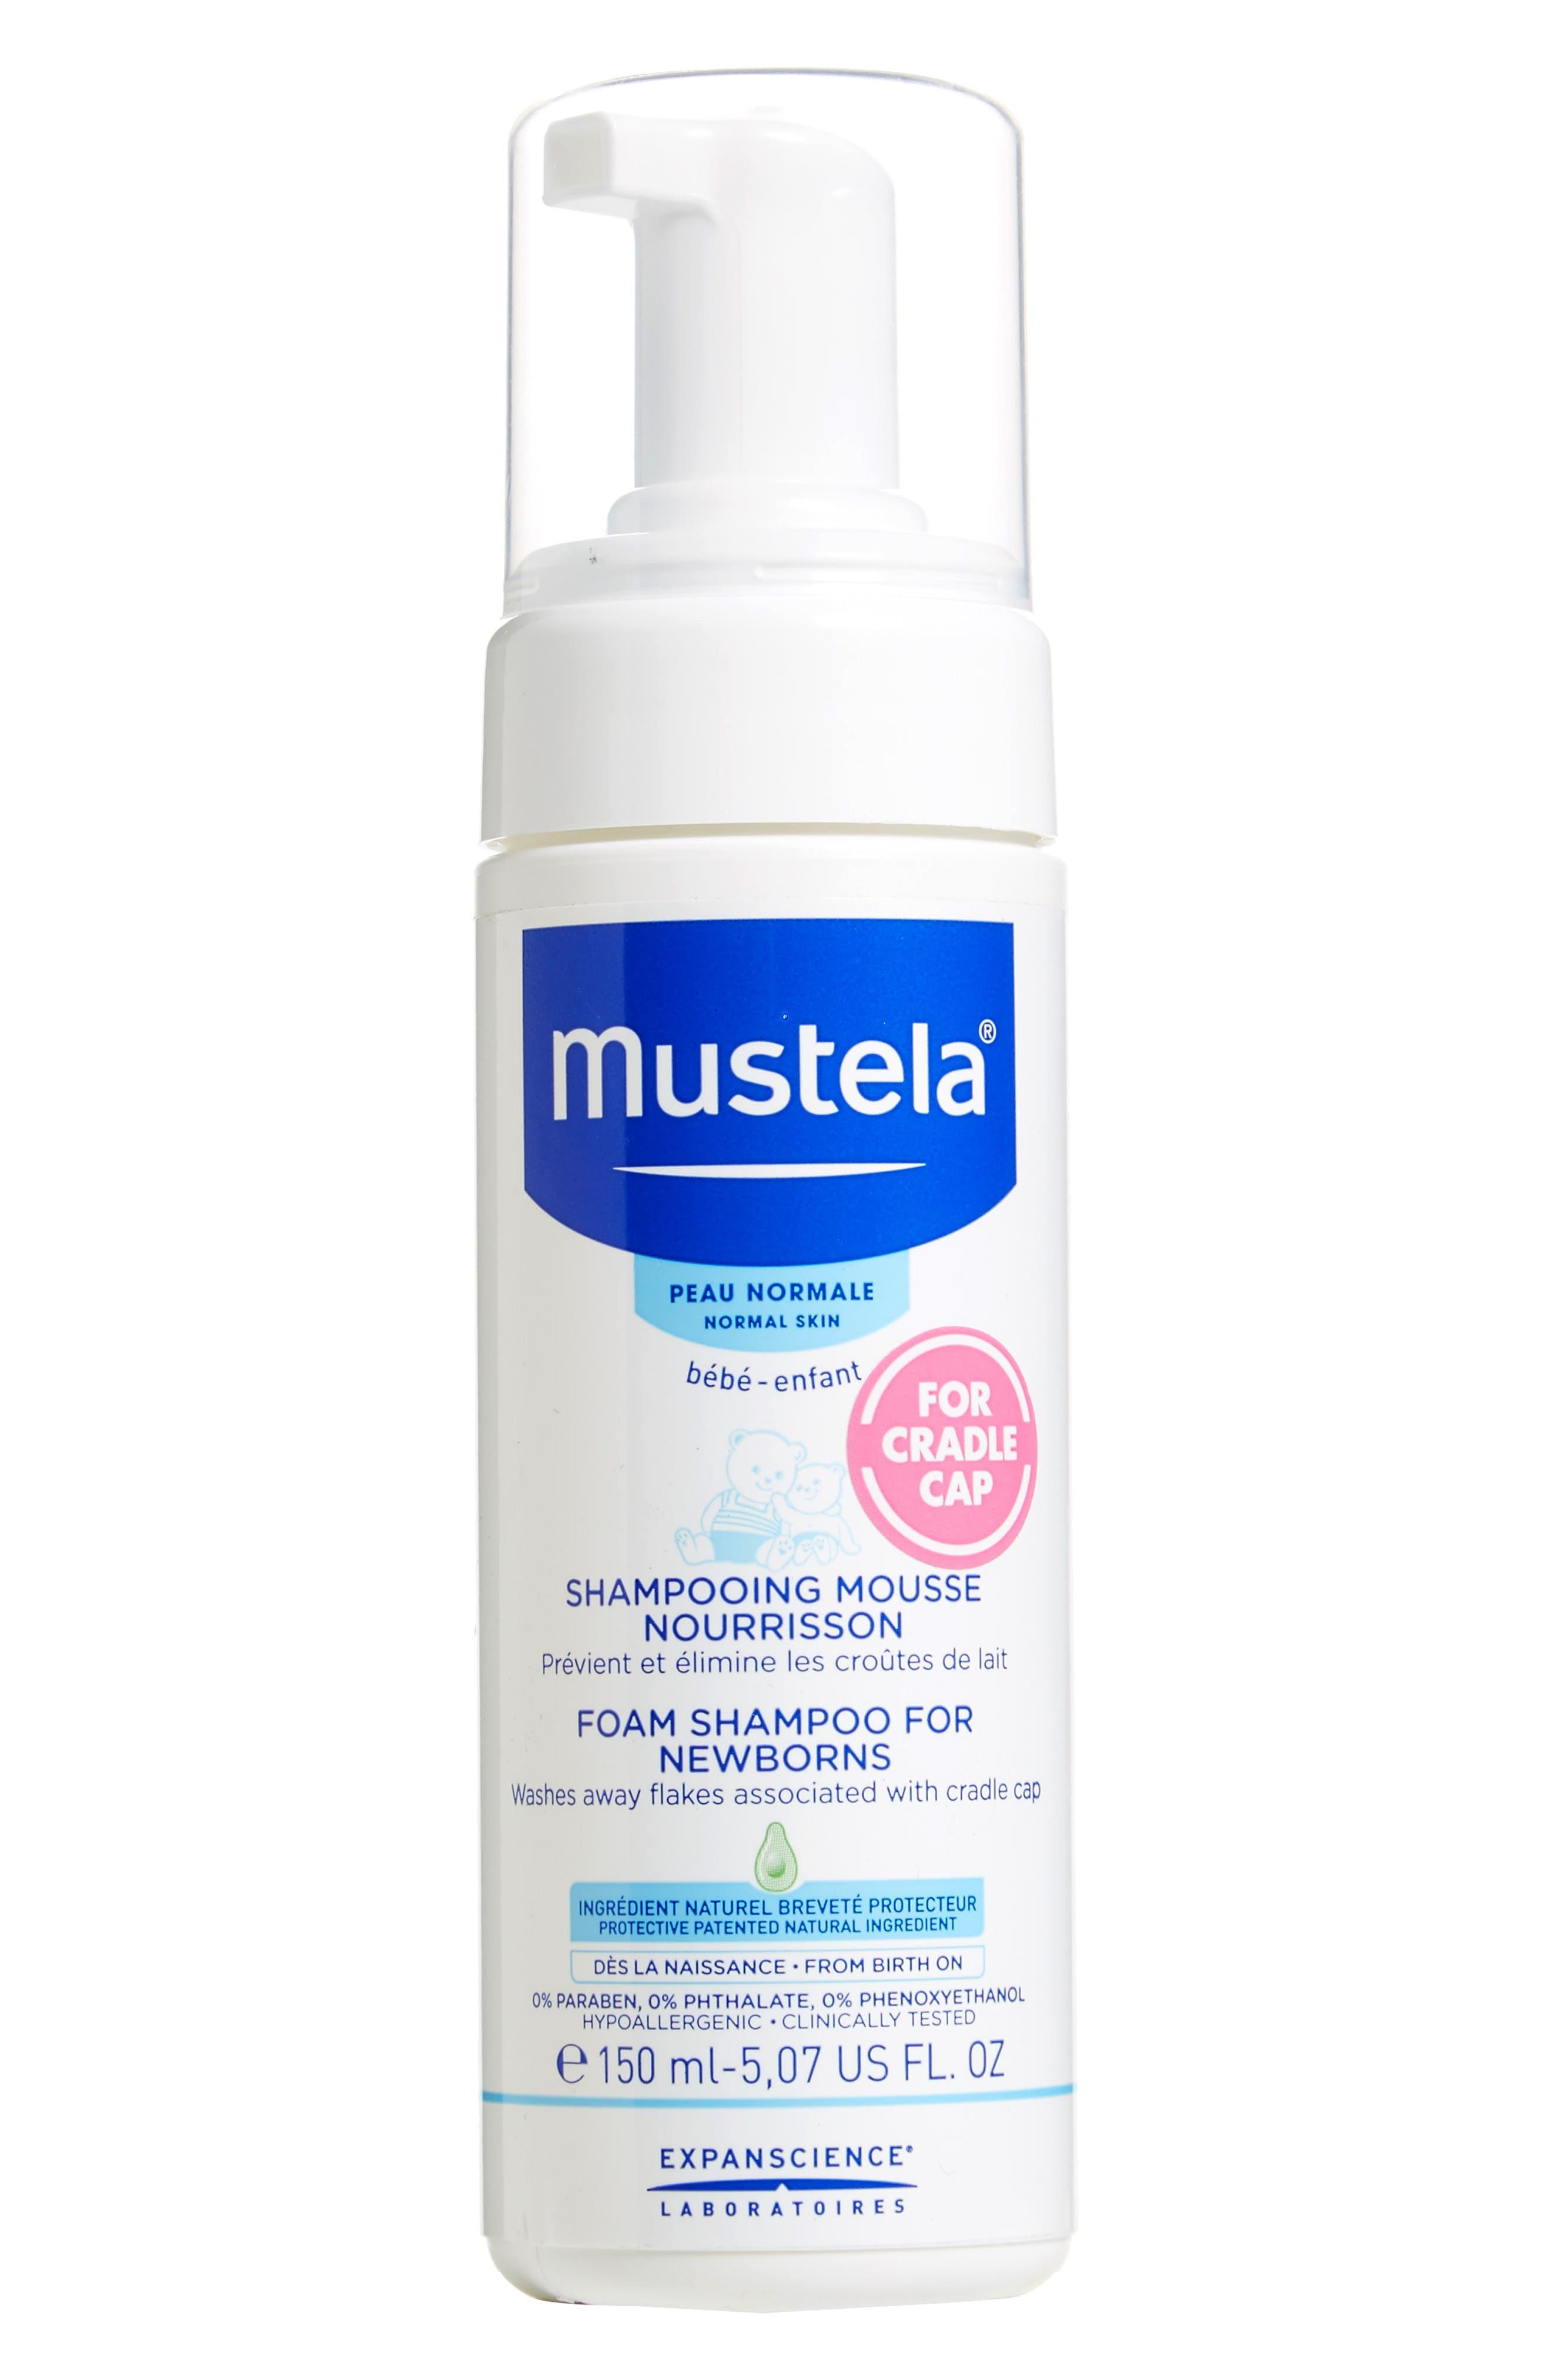 Mustela Foam Shampoo For Newborns Size